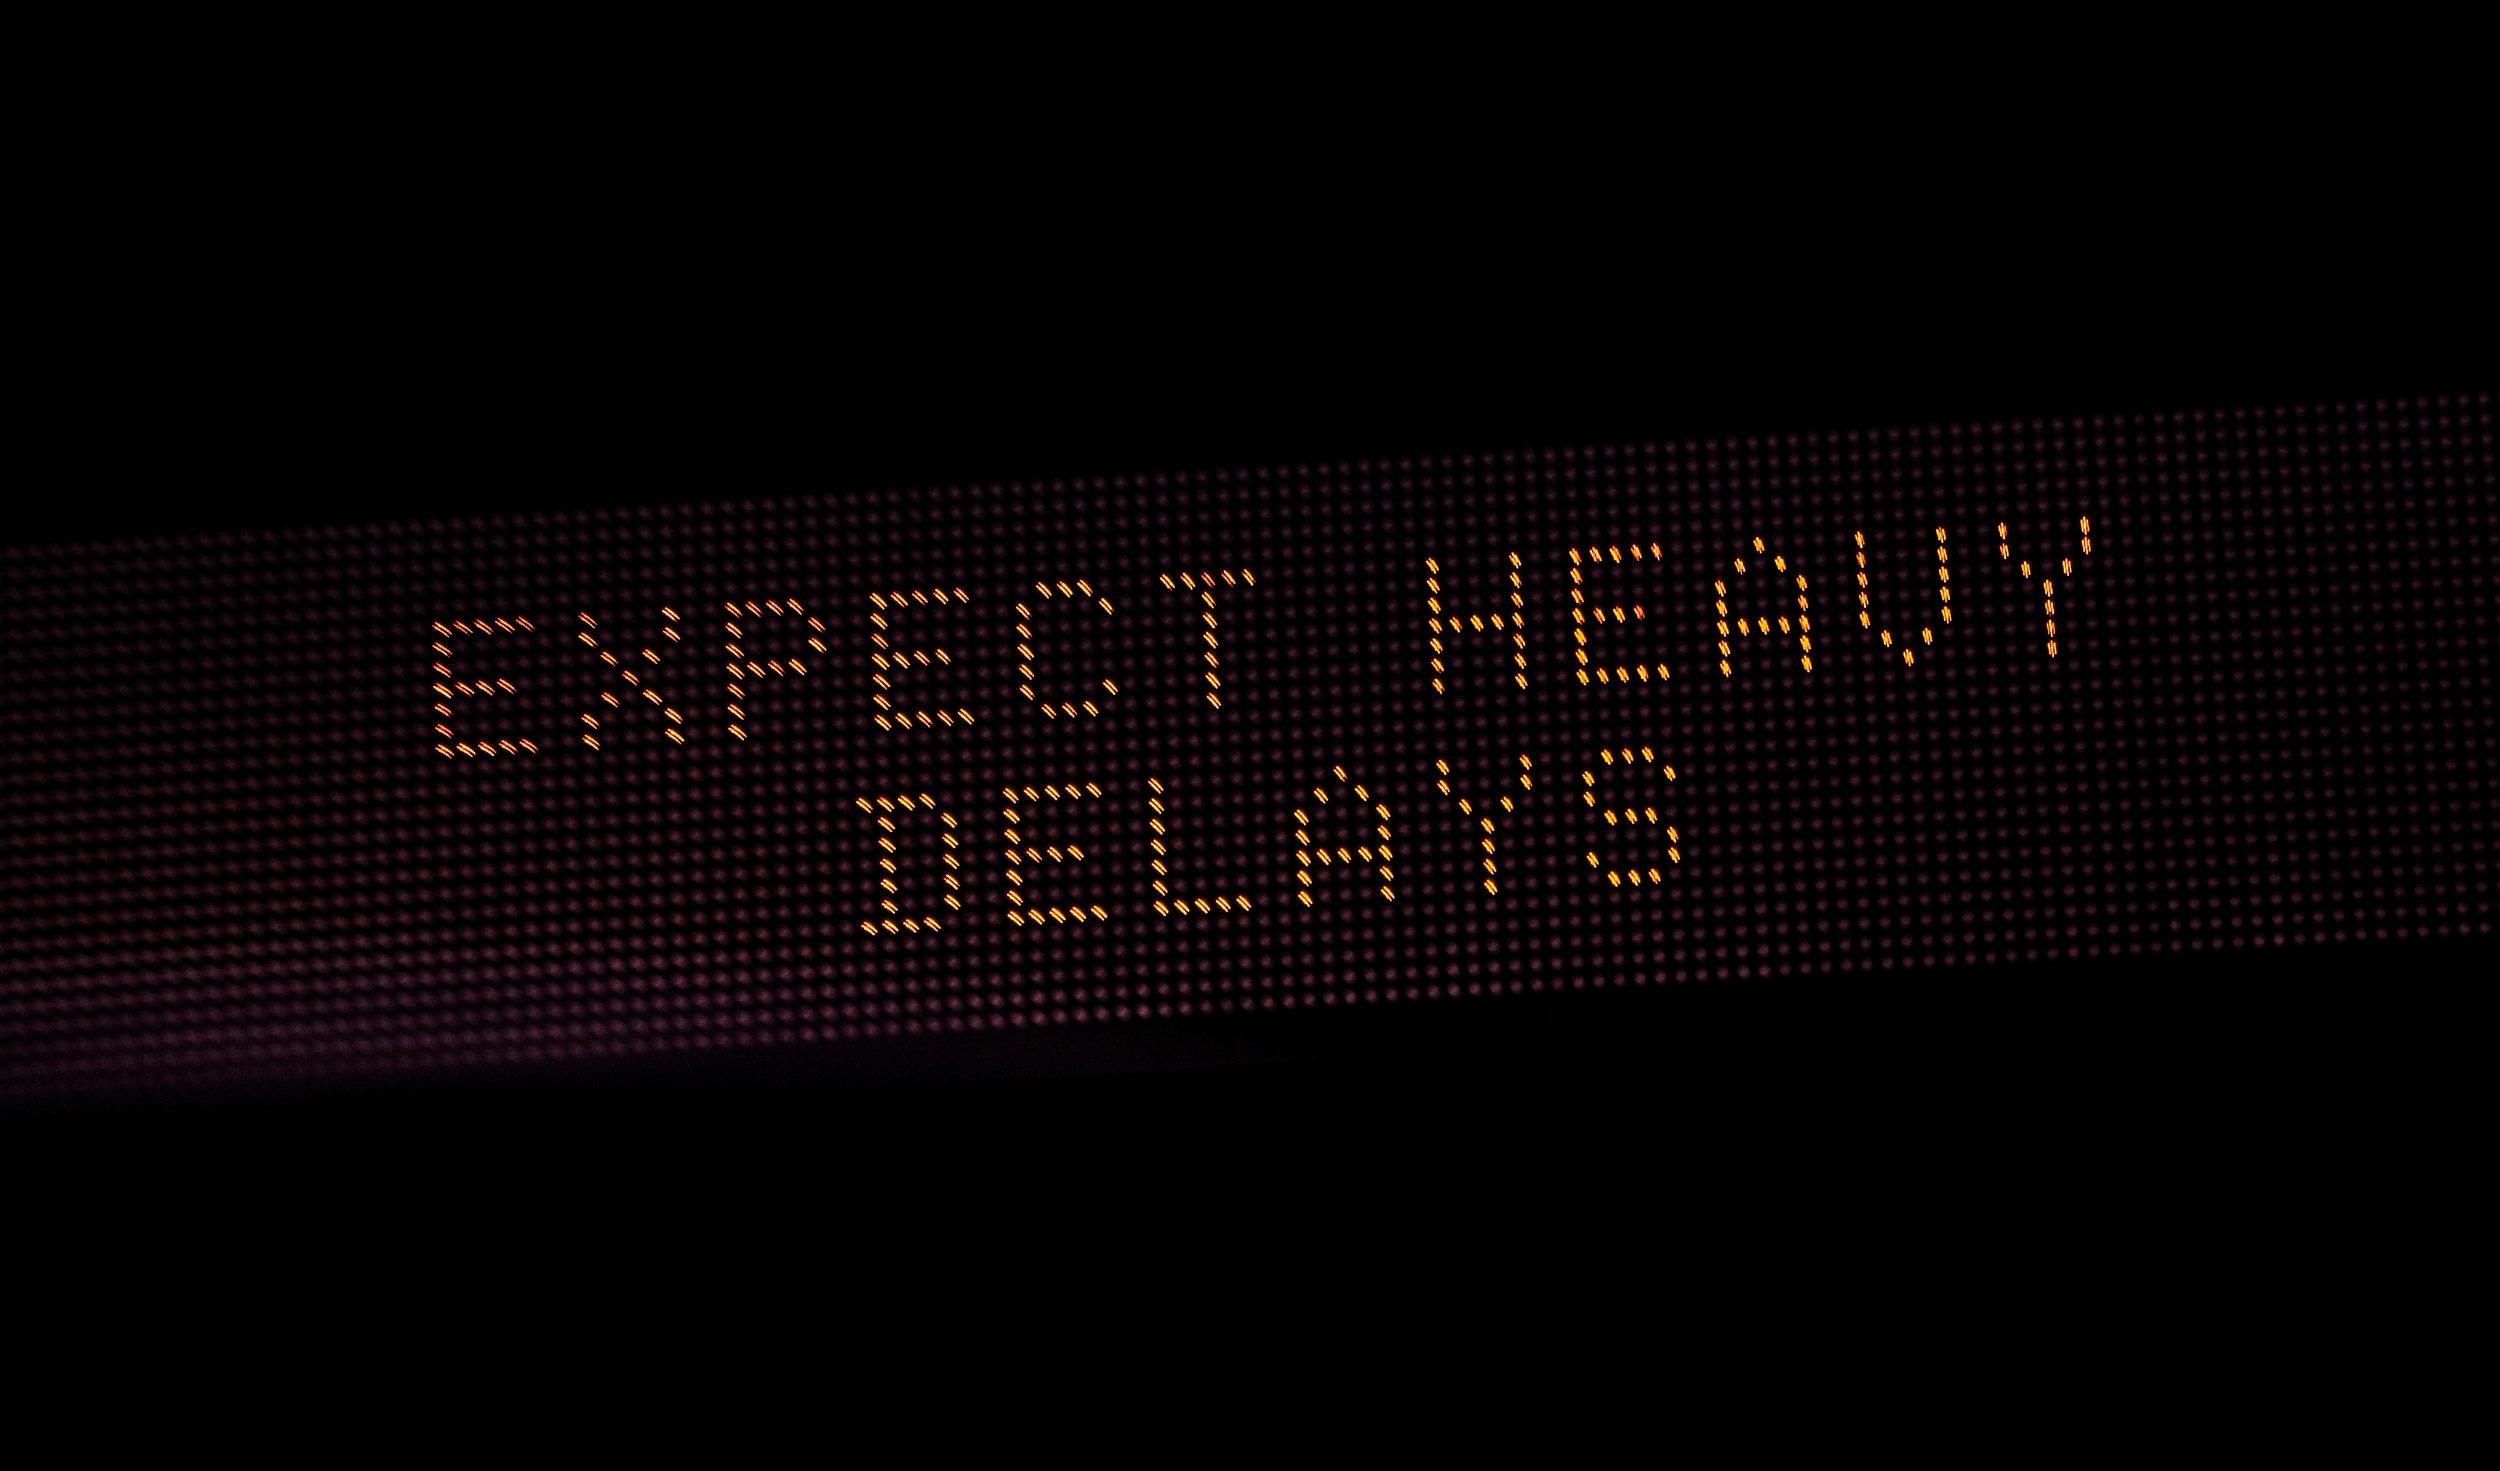 Expect_Heavy_Delays_Traffic_Sign_(24011850854).jpg